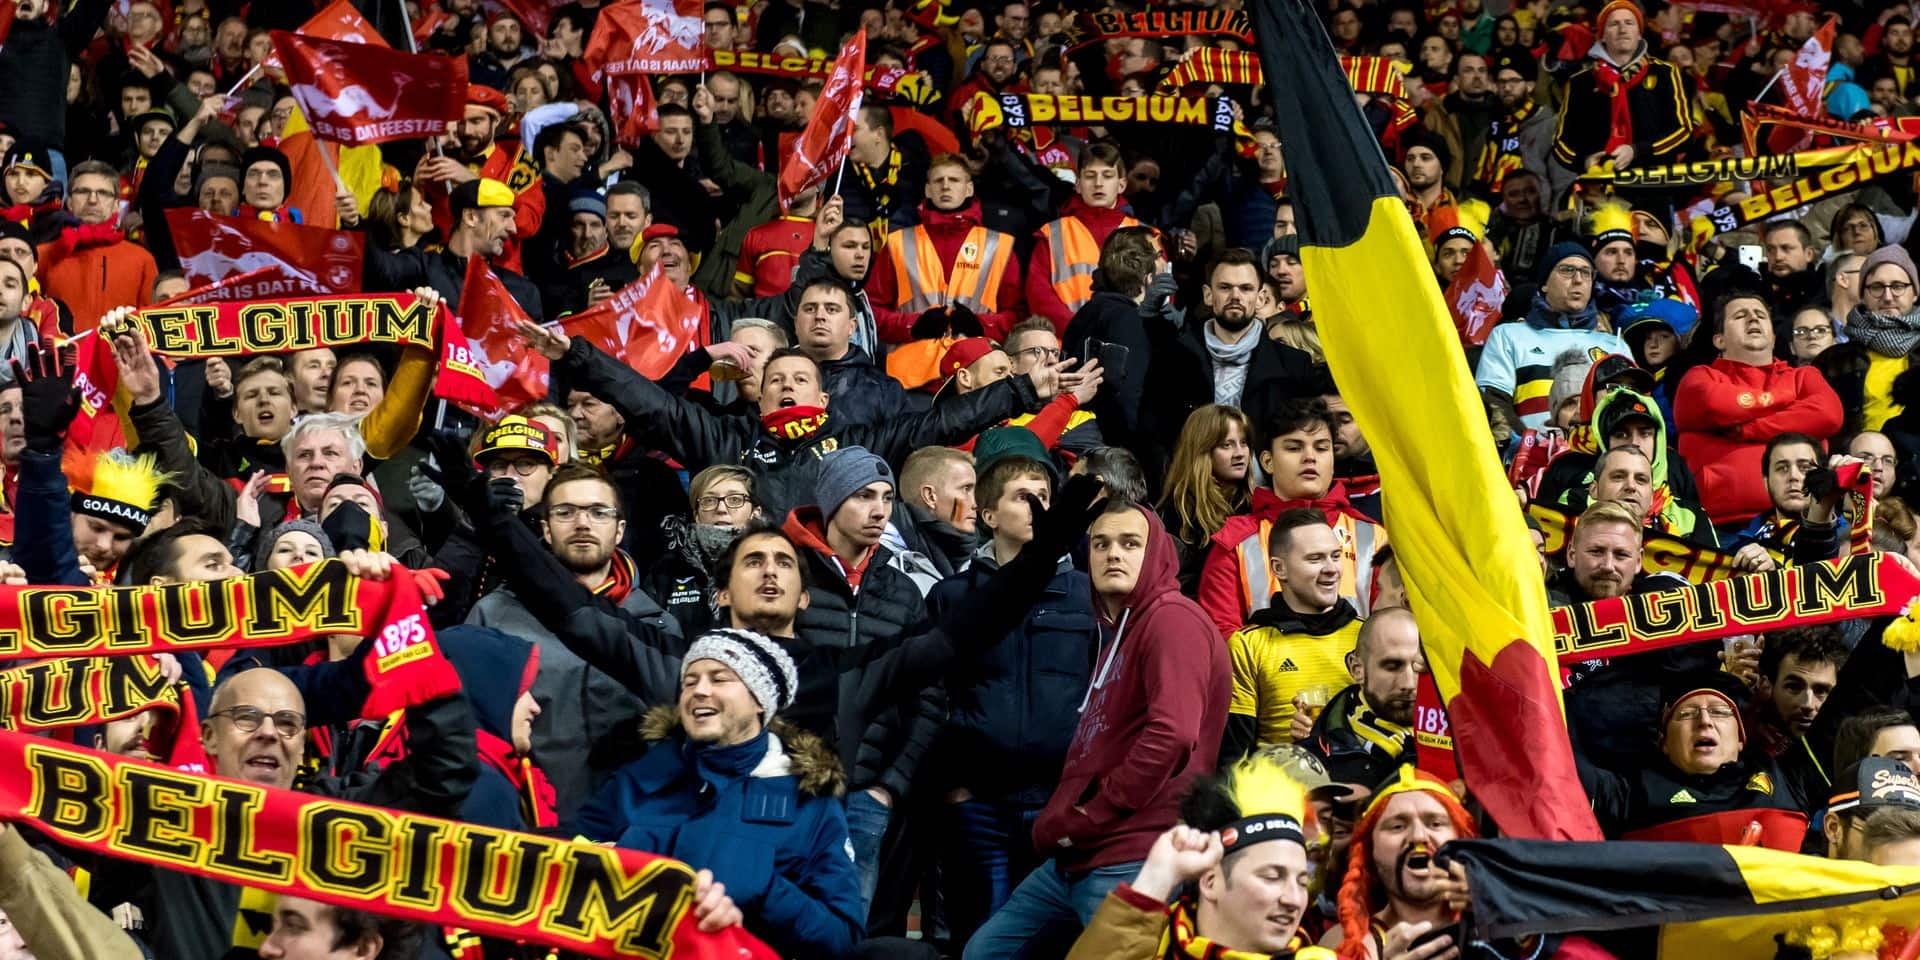 Belgium vs Cyprus